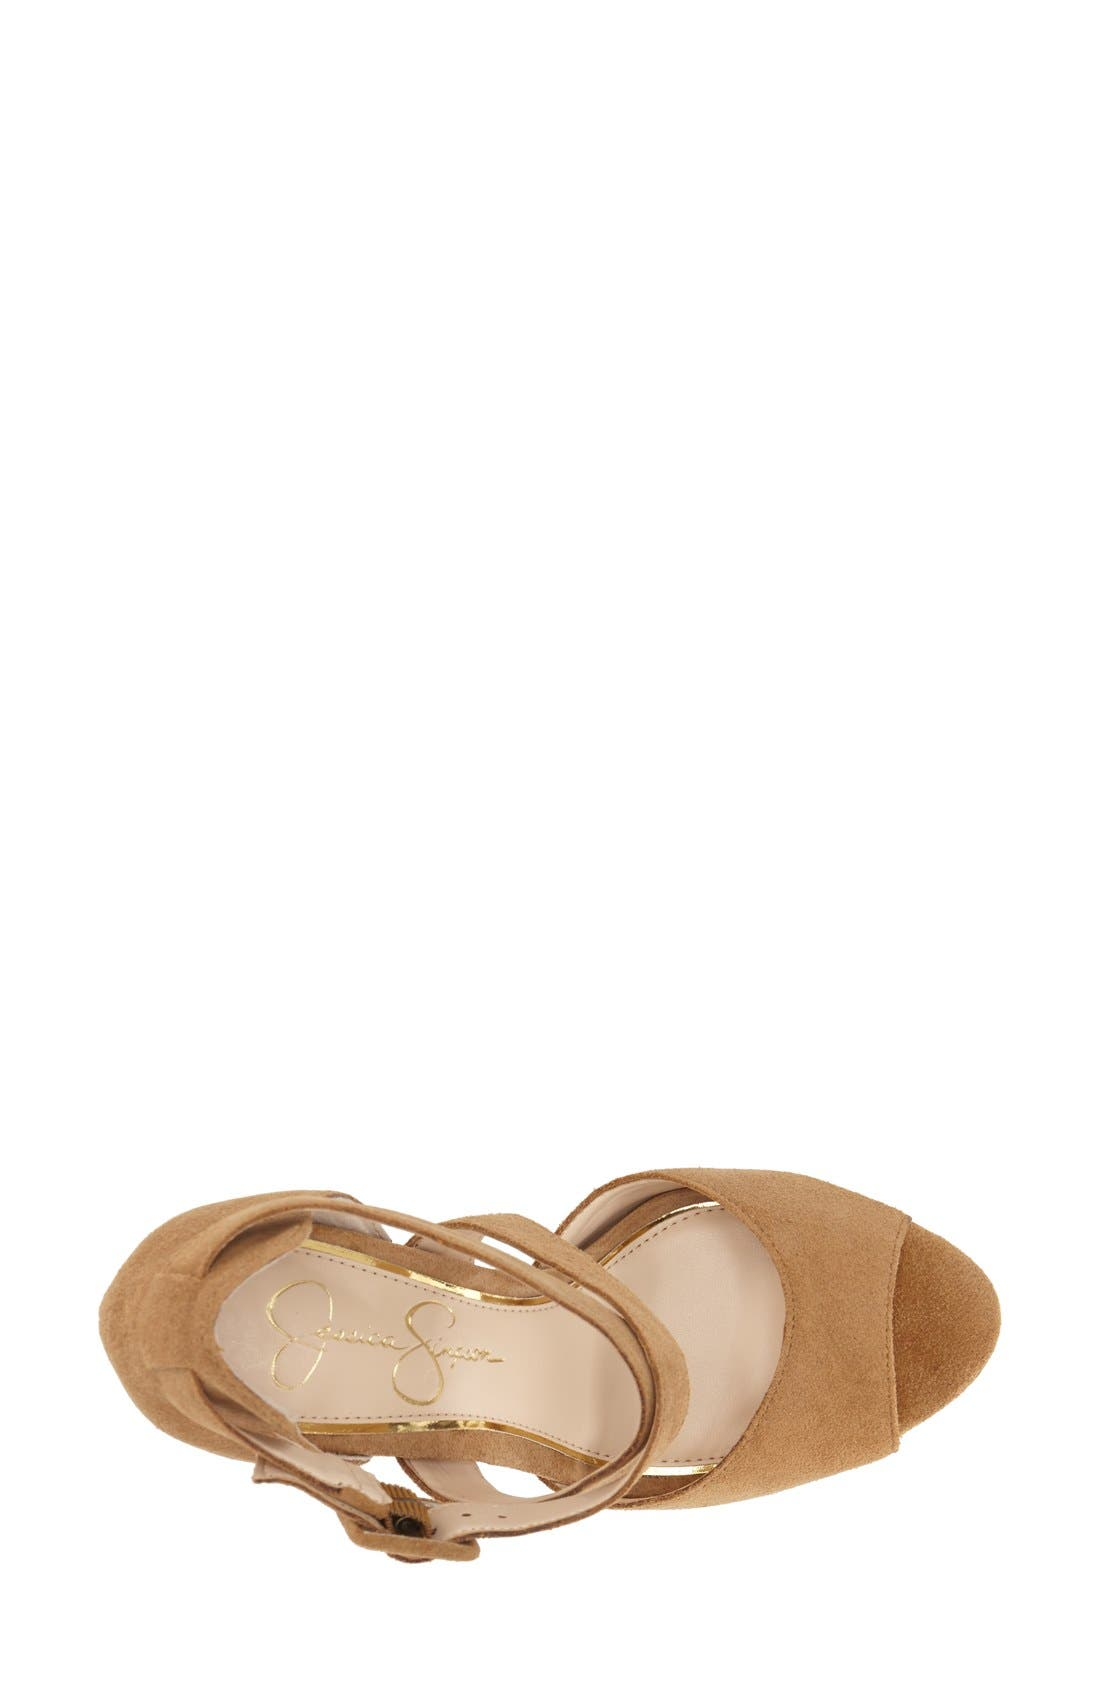 Alternate Image 3  - Jessica Simpson 'Derian' Platform Sandal (Women)